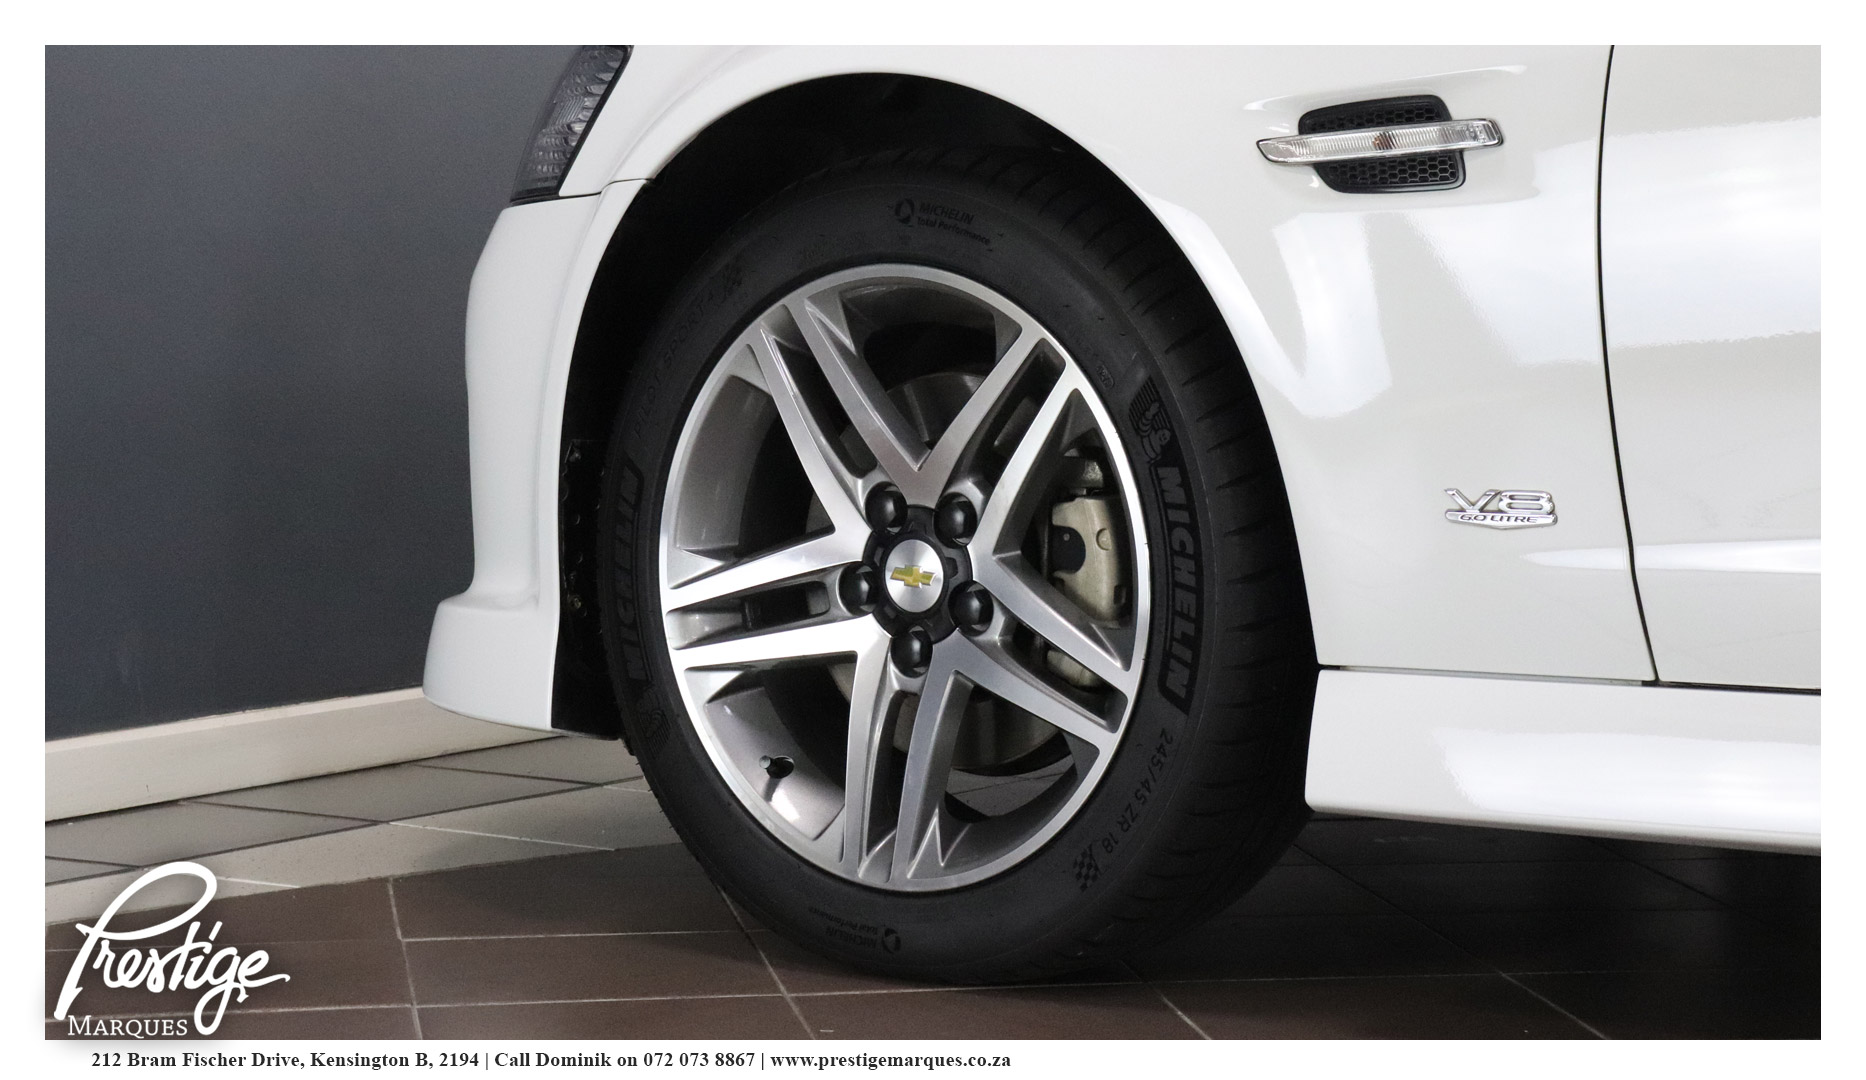 2008-Chevrolet-Lumina-SS-5.4-Manual-Prestige-Marques-Randburg-Sandton-12